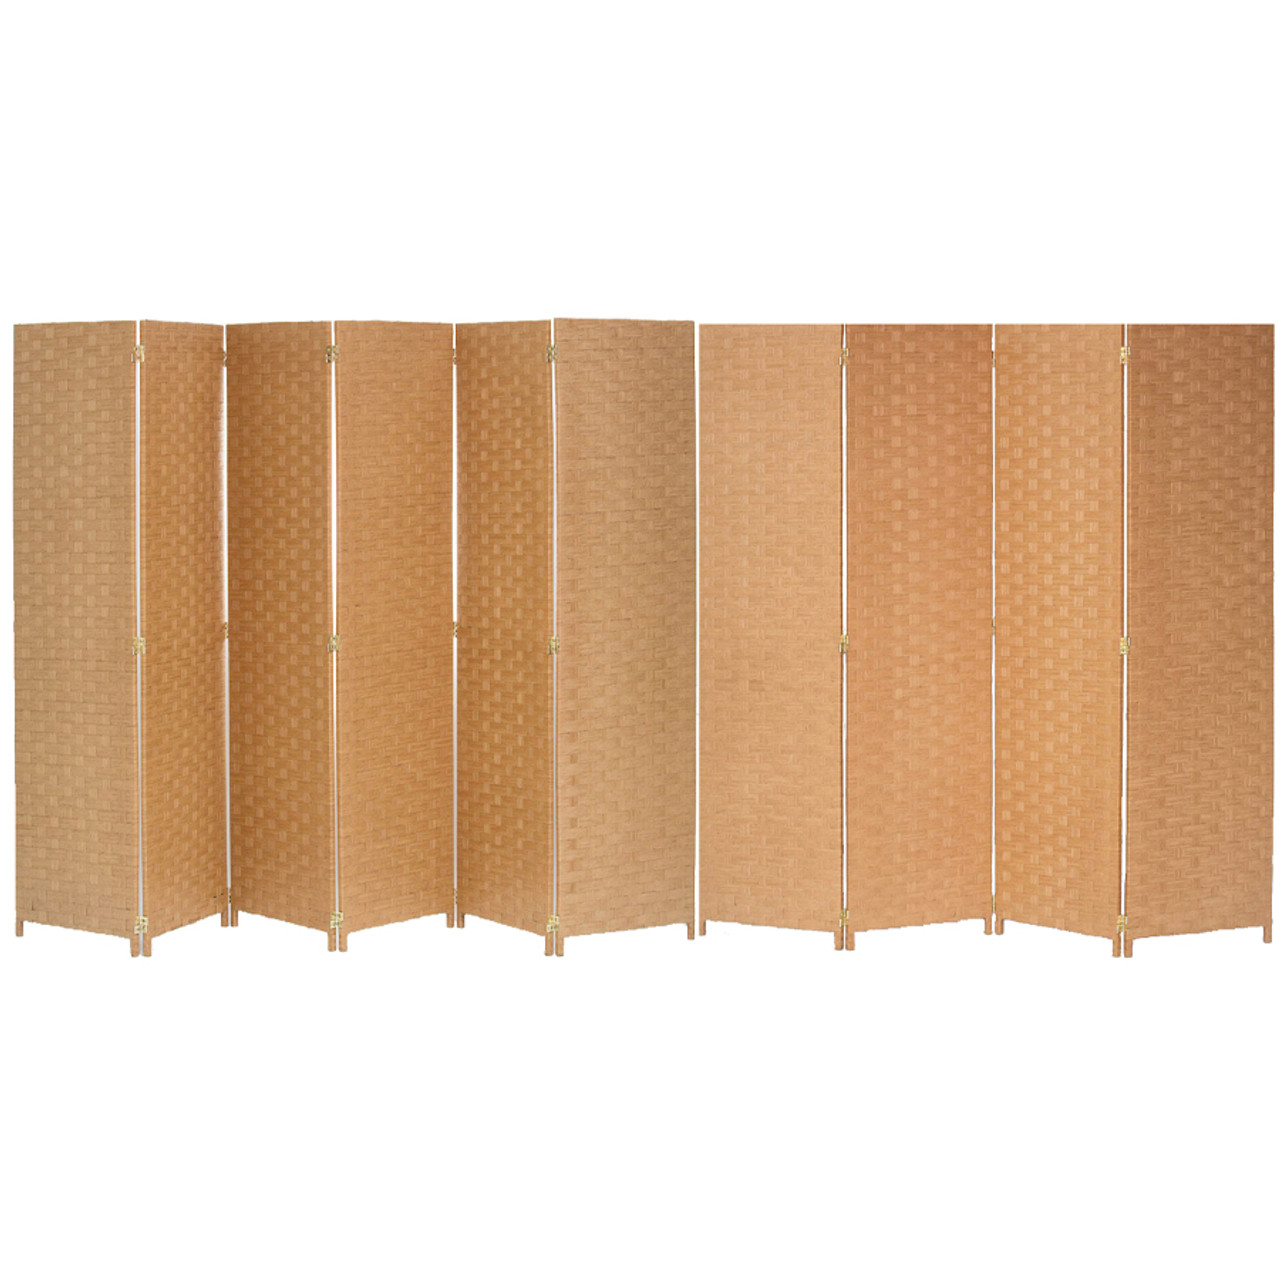 10 Panel Room Divider Privacy Screen, Bamboo Woven Panel in USA, California, New York, New York City, Los Angeles, San Francisco, Pennsylvania, Washington DC, Virginia, Maryland